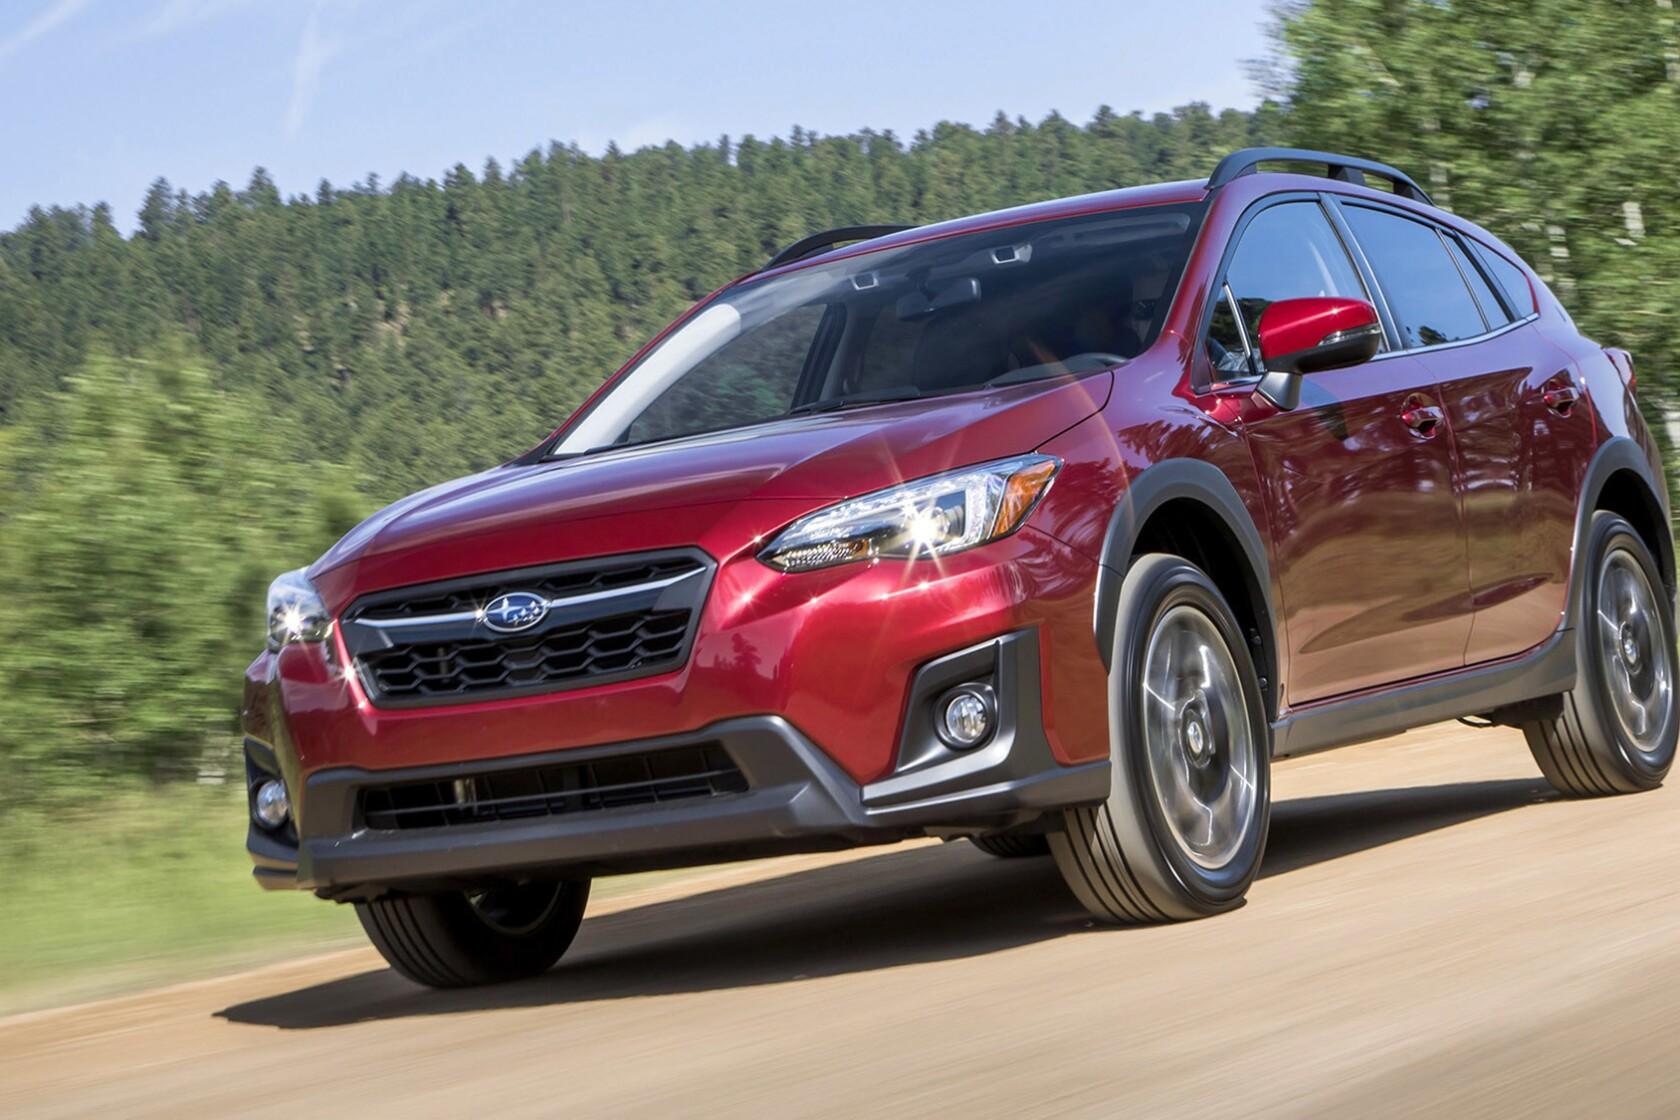 Review: 2018 Subaru Crosstrek: Ready to roam off-road? - Los